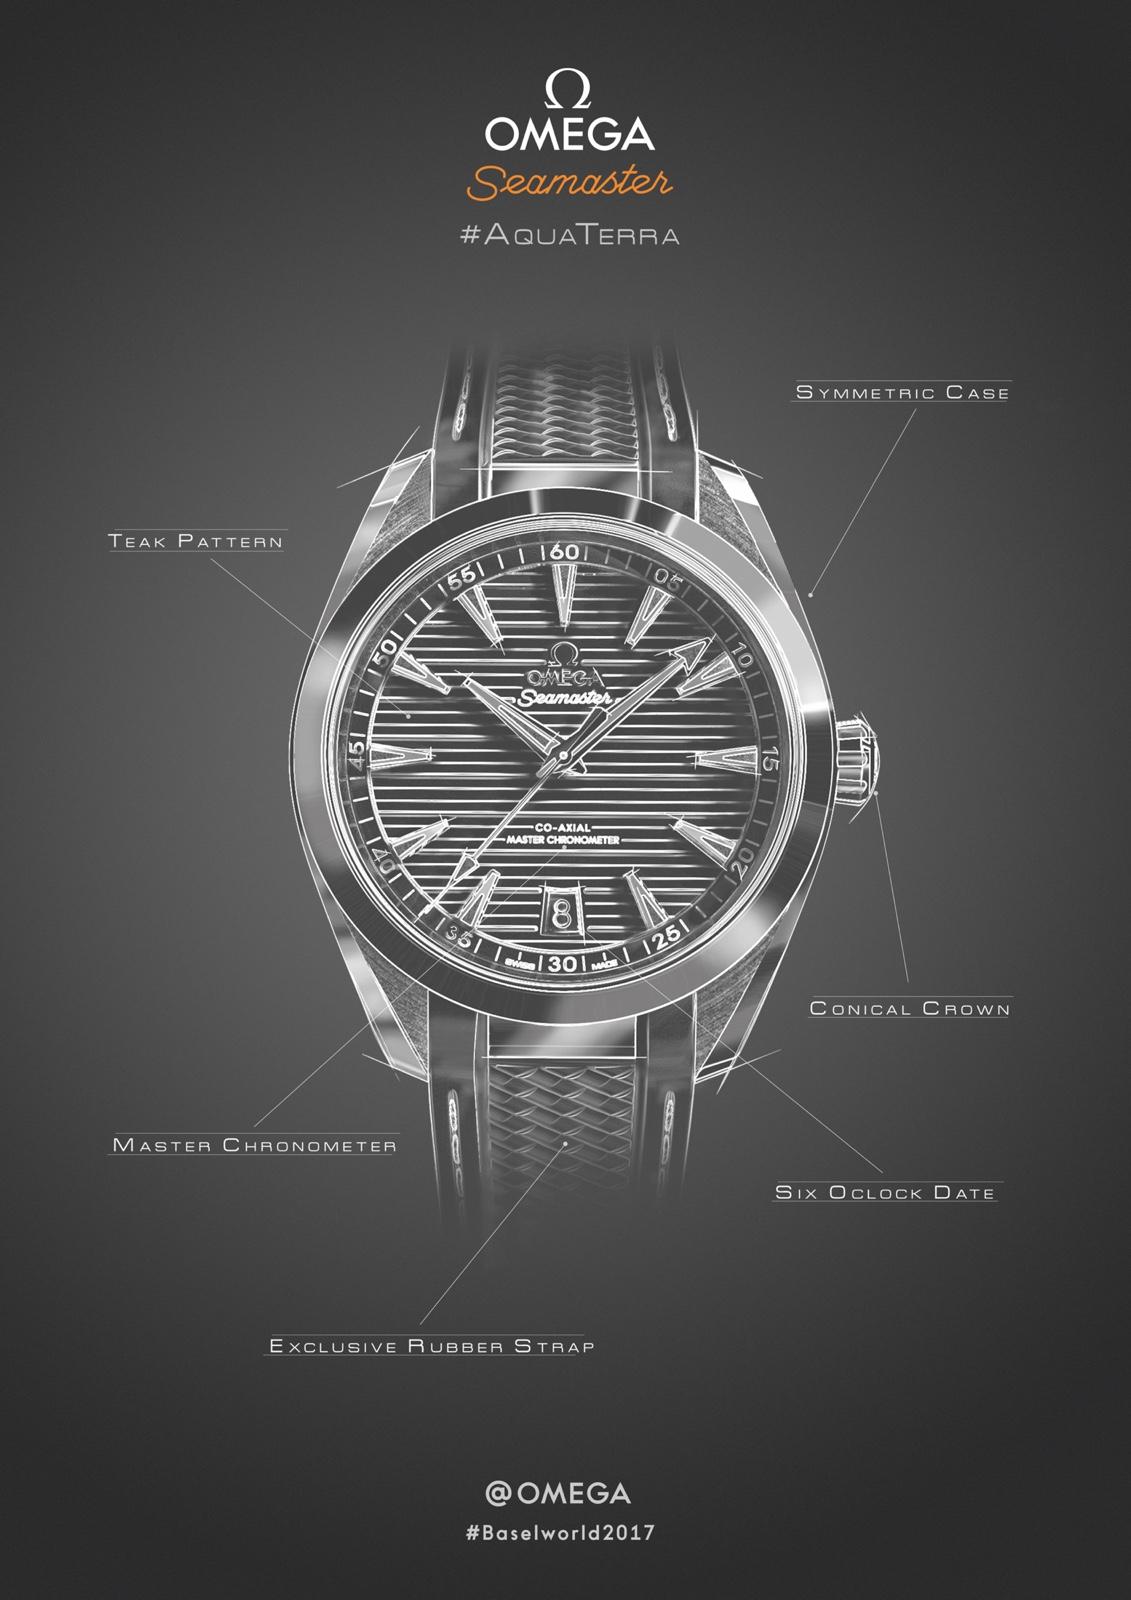 Omega-Seamaster-Aqua-Terra-Master-Chronometer-Infografia-1